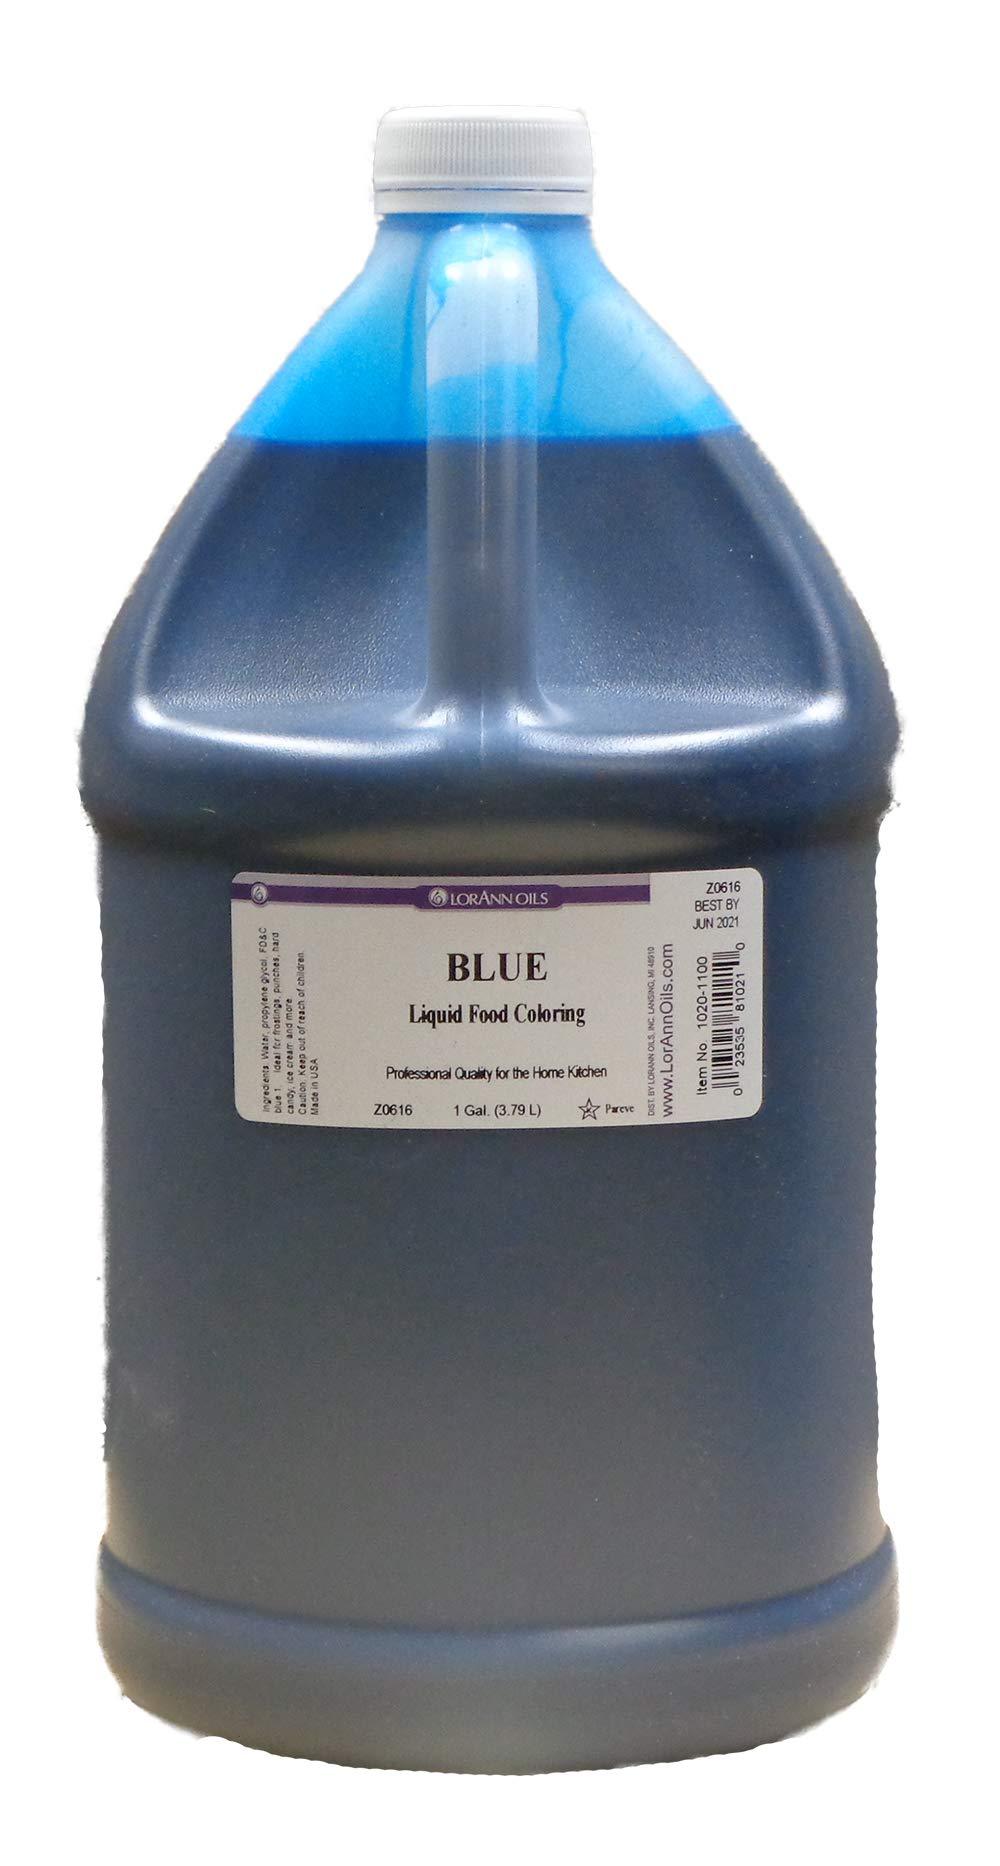 LorAnn Blue Liquid Food Coloring, Gallon Size